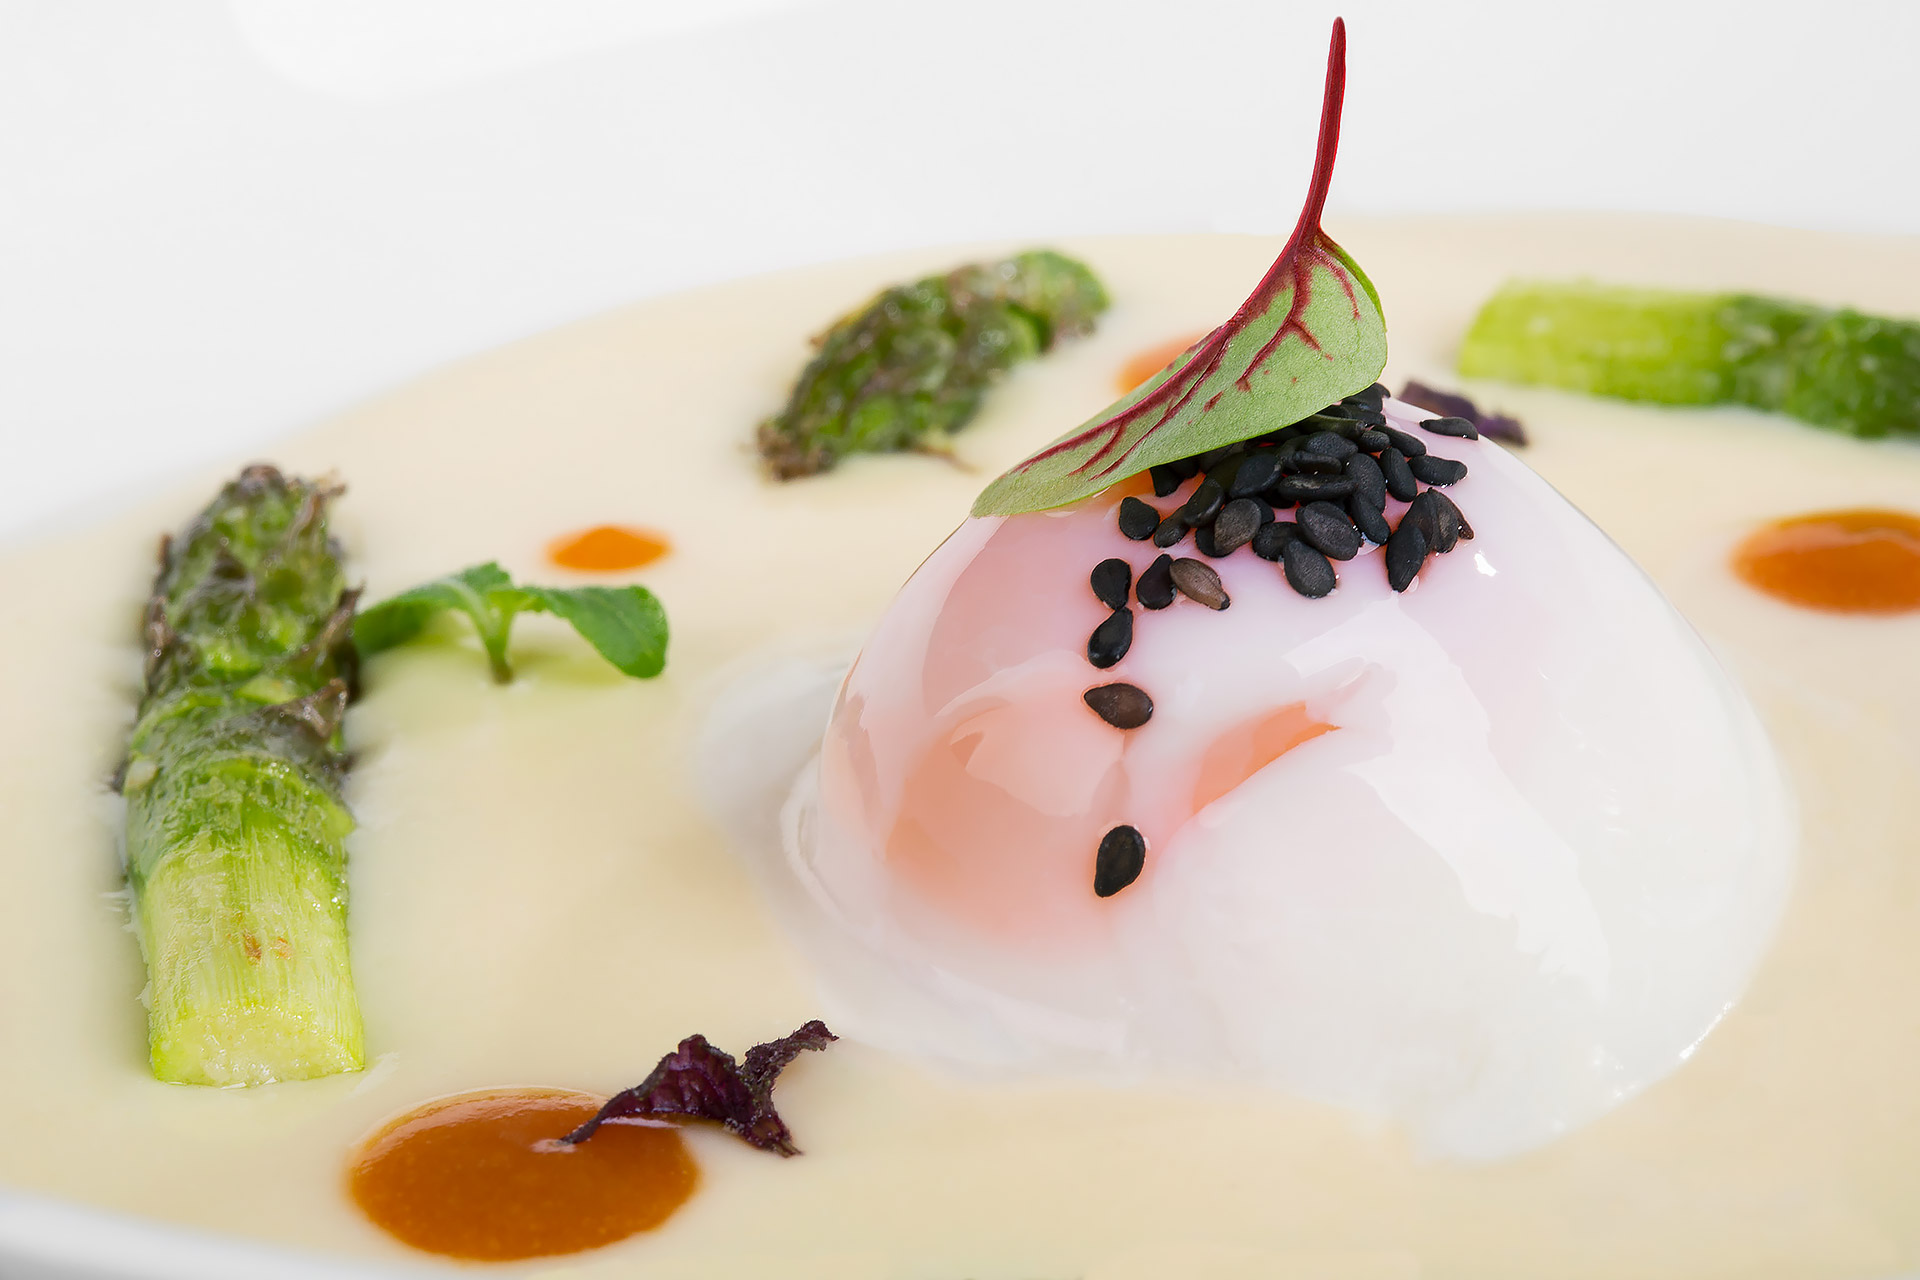 Fotografo-food-Treviso-Venezia-Brescia-12_O